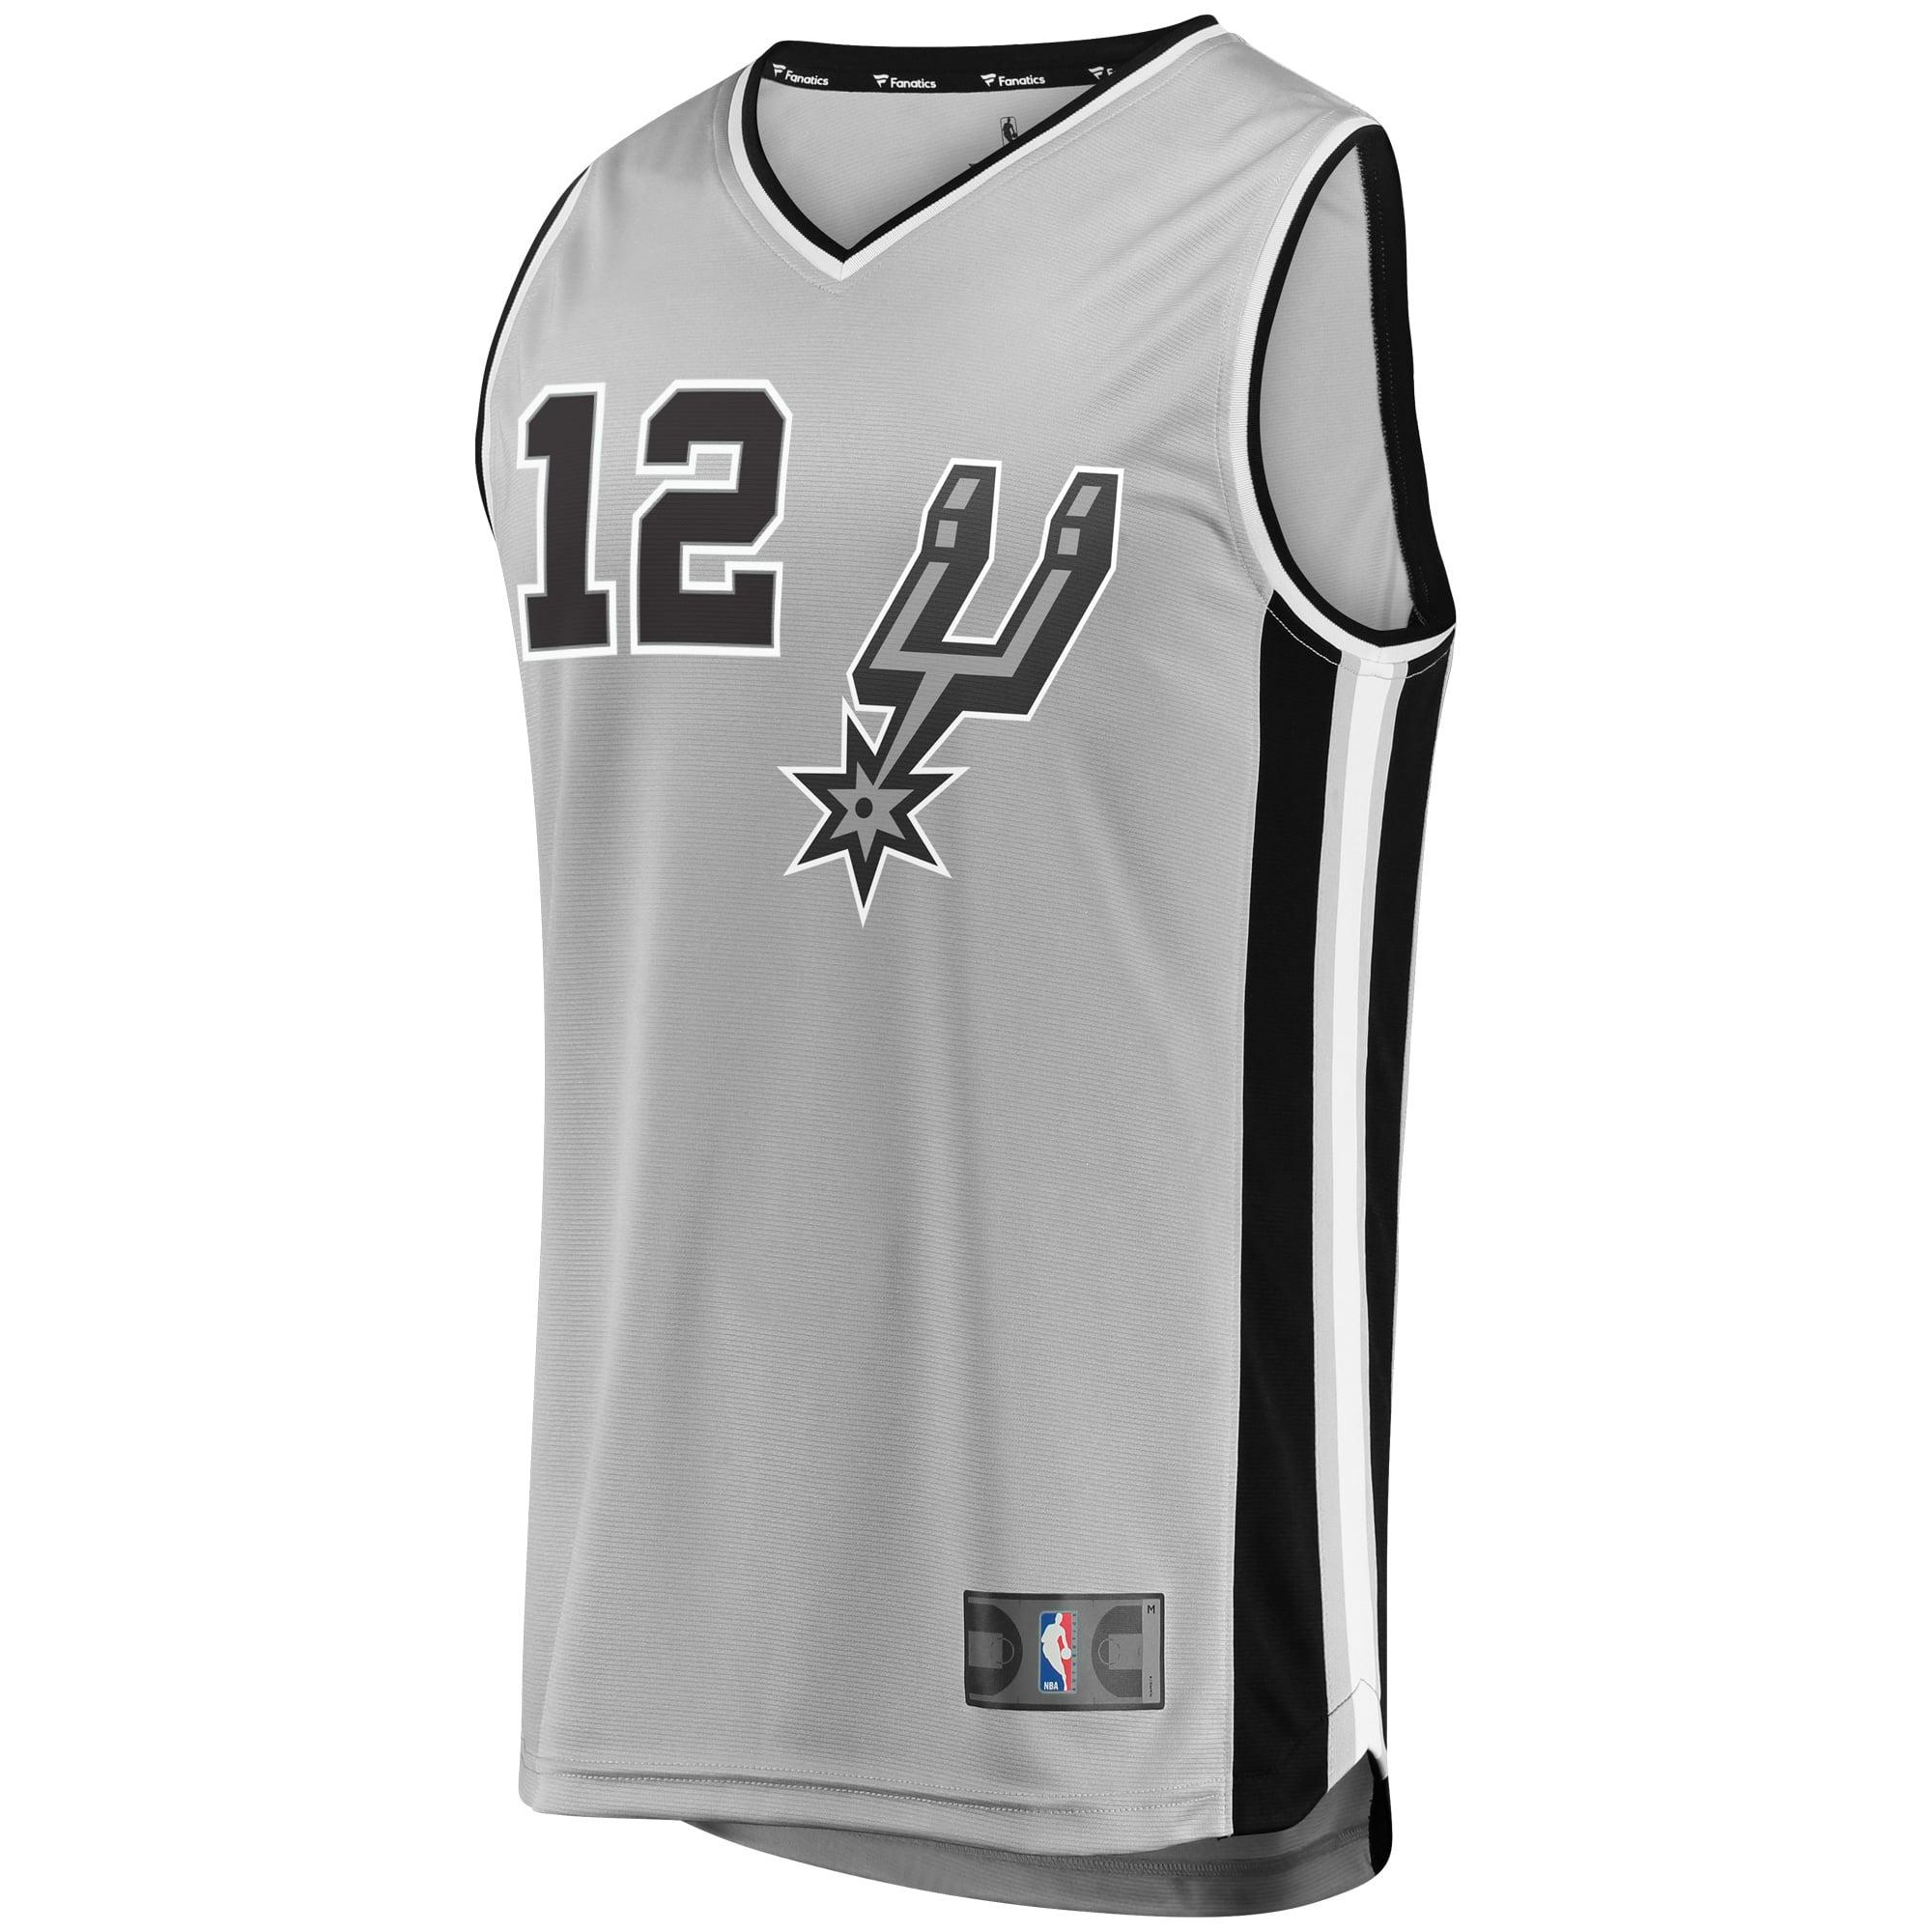 c962ce8a1b4 LaMarcus Aldridge San Antonio Spurs Fanatics Branded Fast Break Replica  Player Jersey - Statement Edition - Gray - Walmart.com